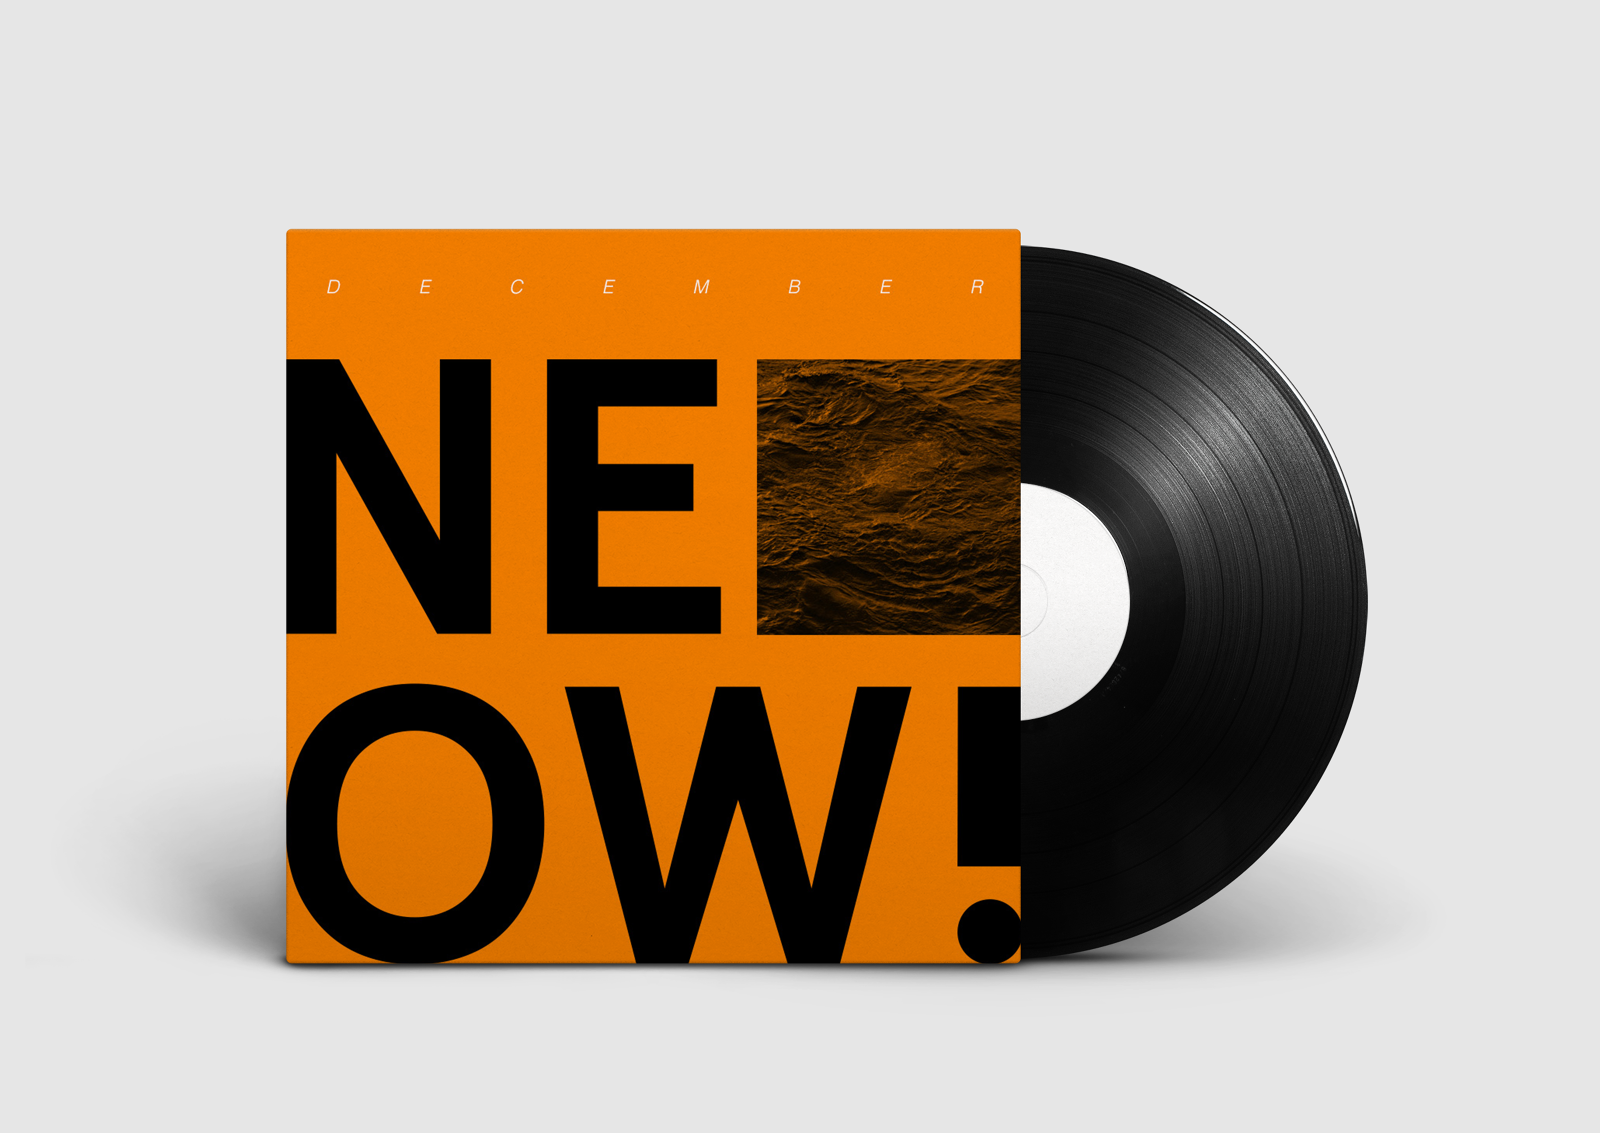 NEOW__AlbumMockup_December17_1600_c.png